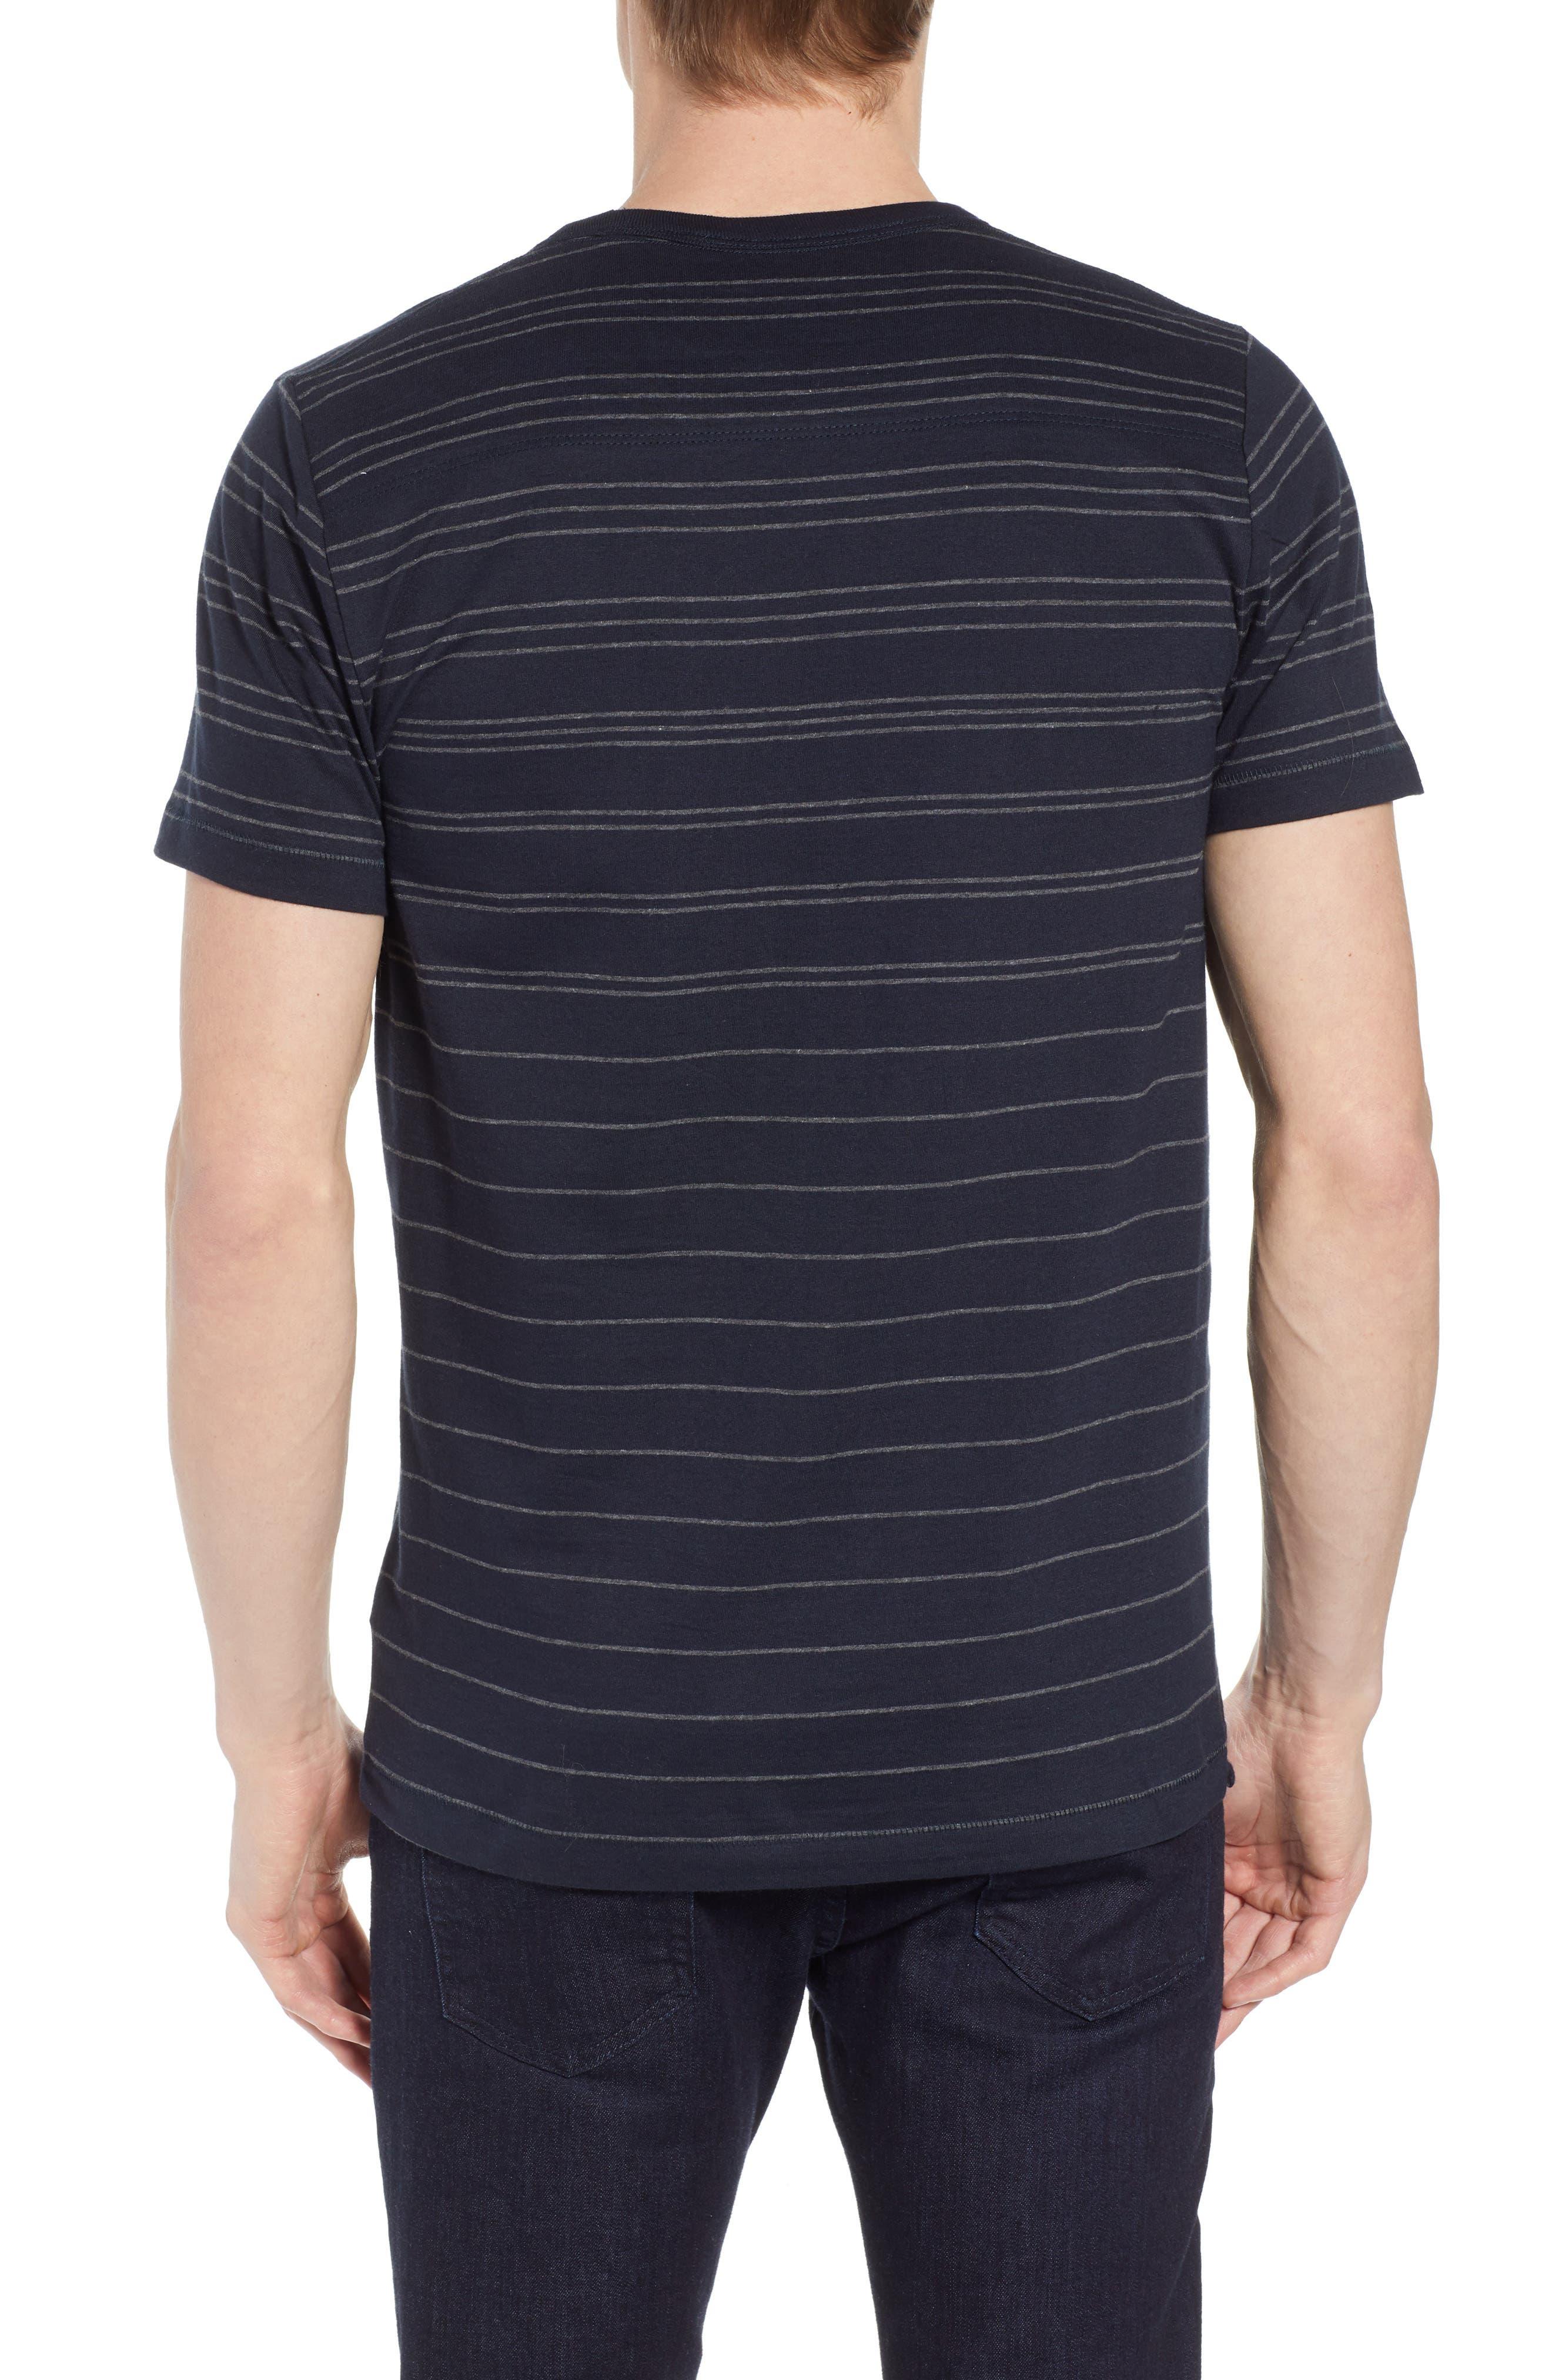 Summer Graded Stripe Pocket T-Shirt,                             Alternate thumbnail 2, color,                             Marine Blue Charcoal Melange